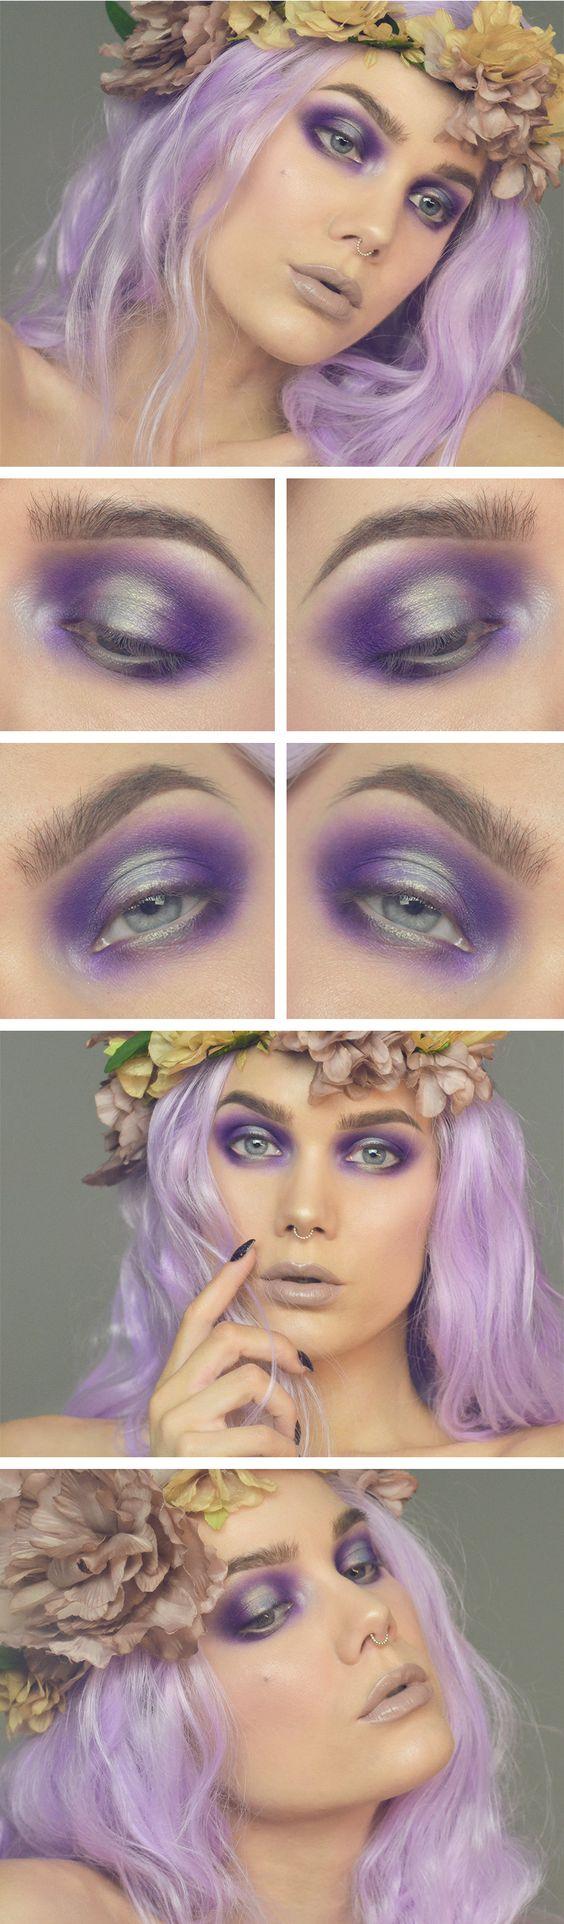 Fairy Halloween Makeup Tips - Linda Hallberg Todays look